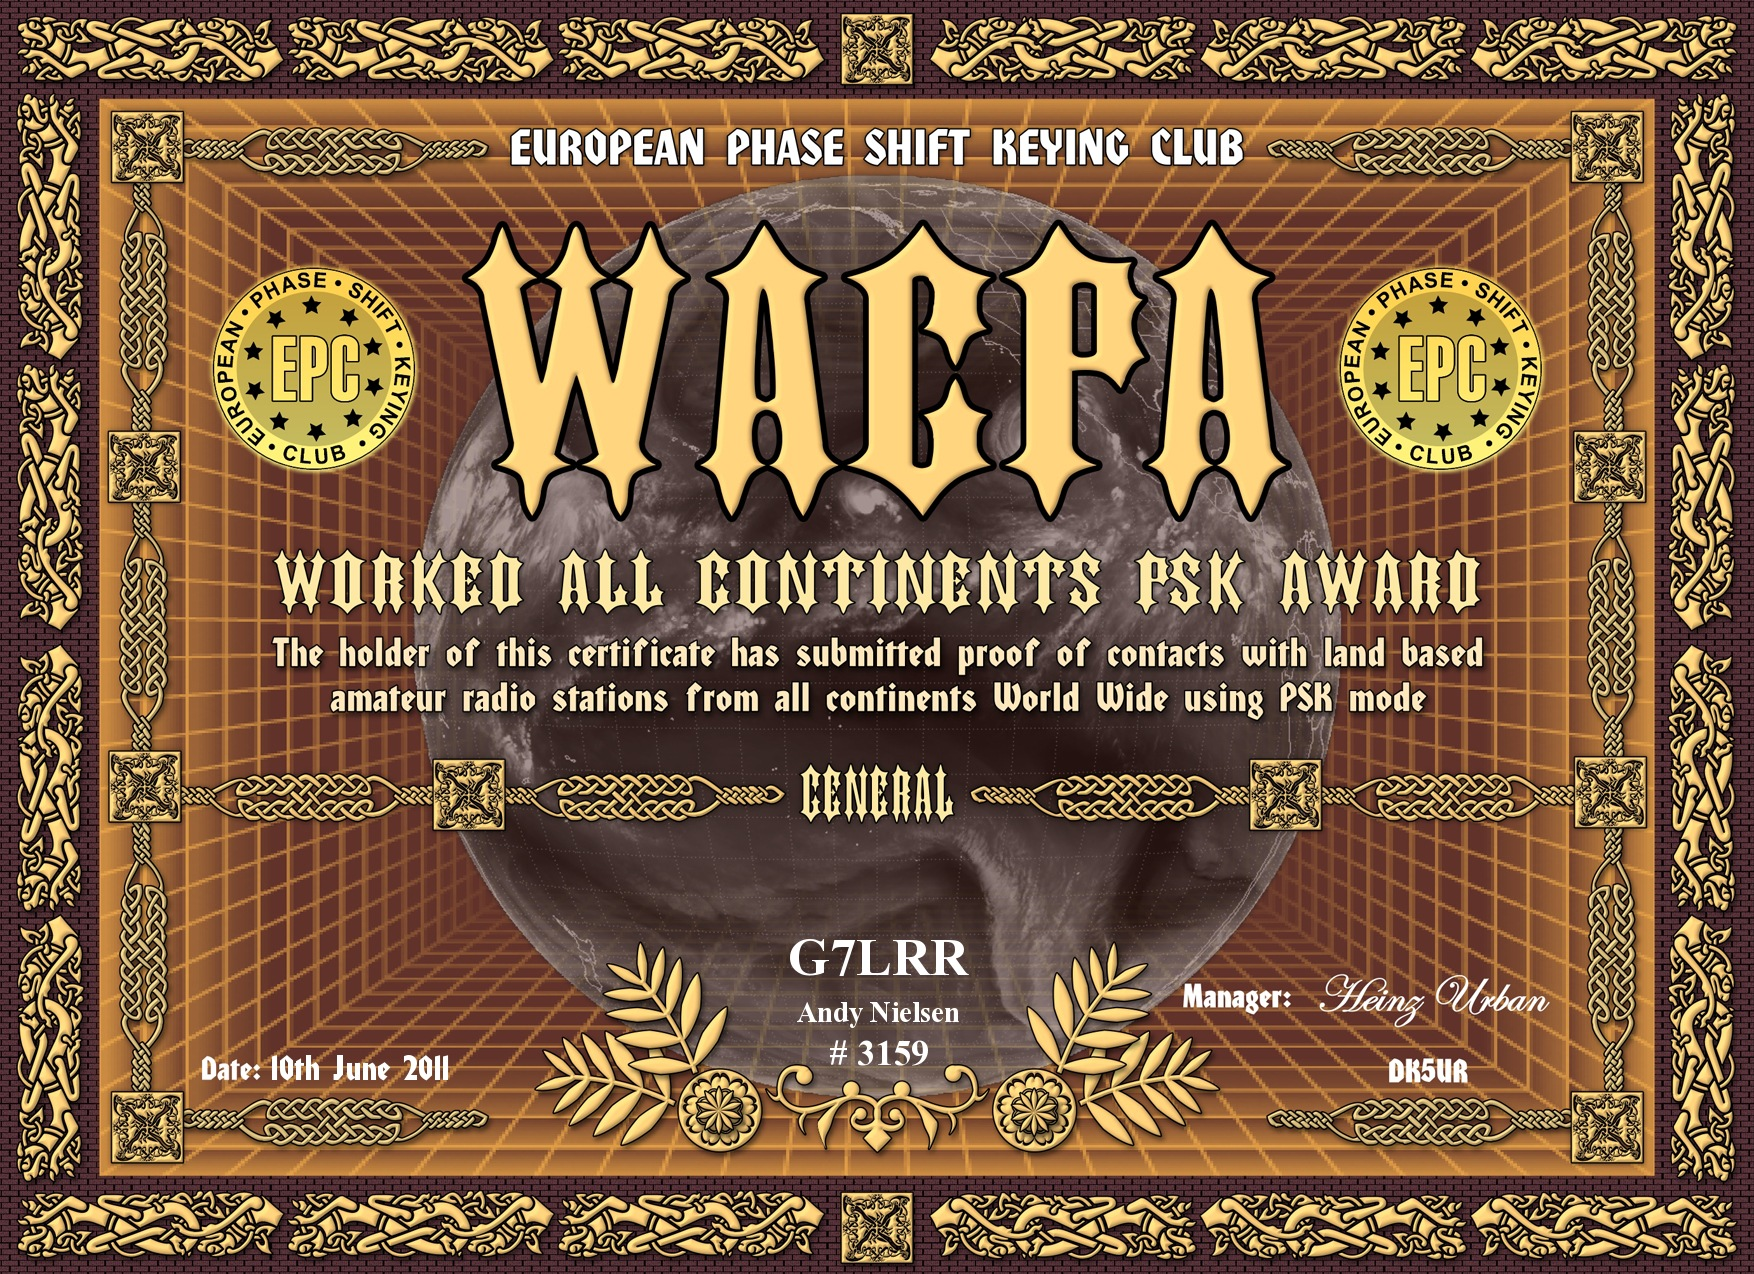 G7LRR_WACPA_GENERAL